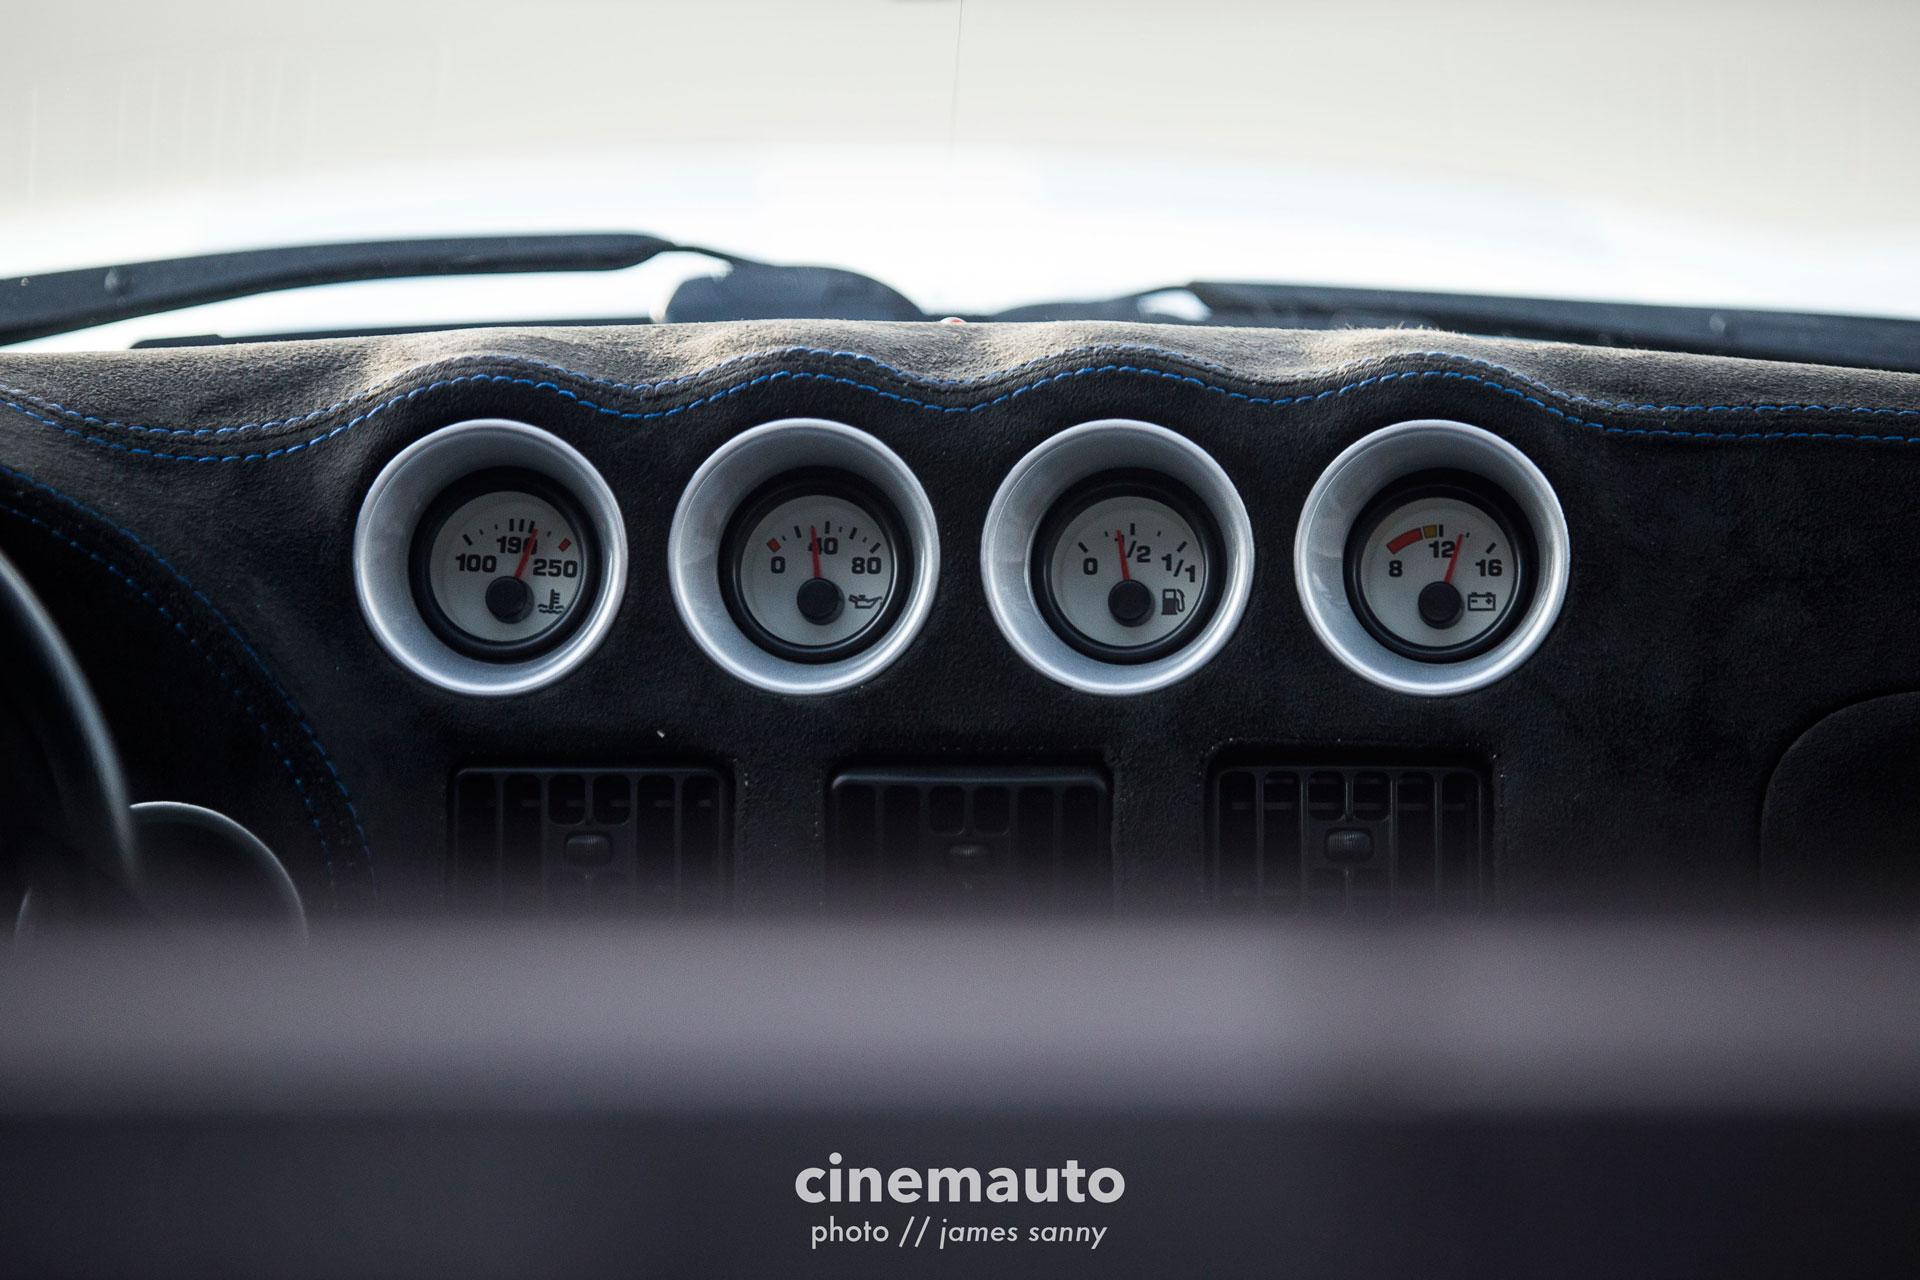 cinemauto_6-sm.jpg